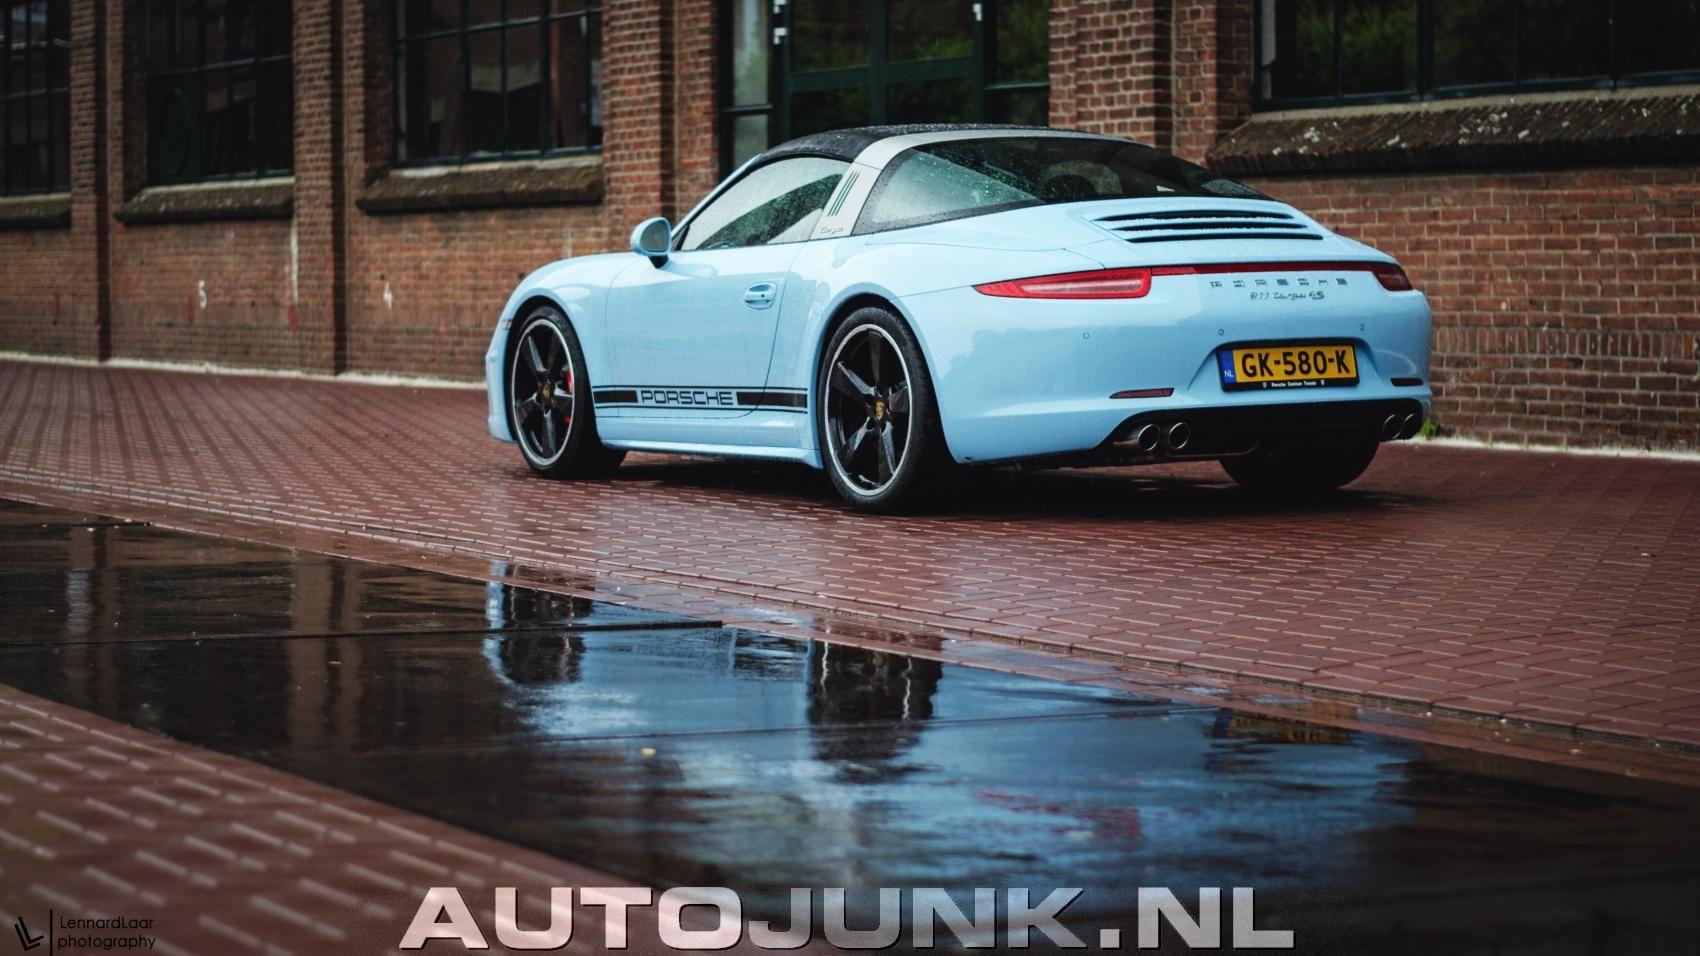 Targa 4S Exclusive Edition foto's » Autojunk.nl (149395)